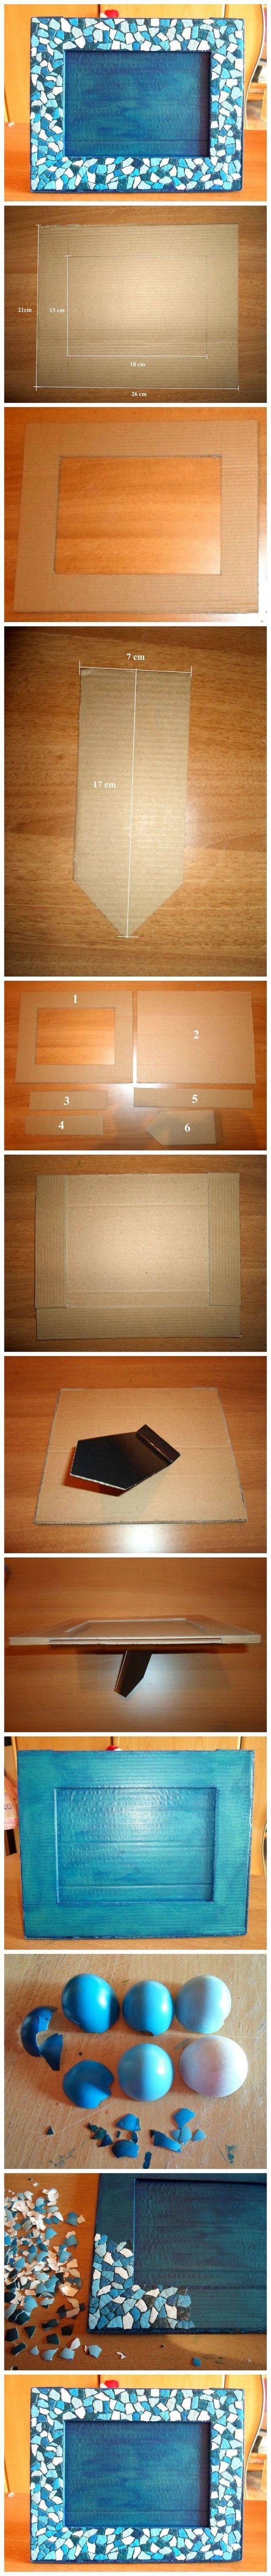 #DIY Marco de fotos   con cartón y cascarás de huevo teñidas